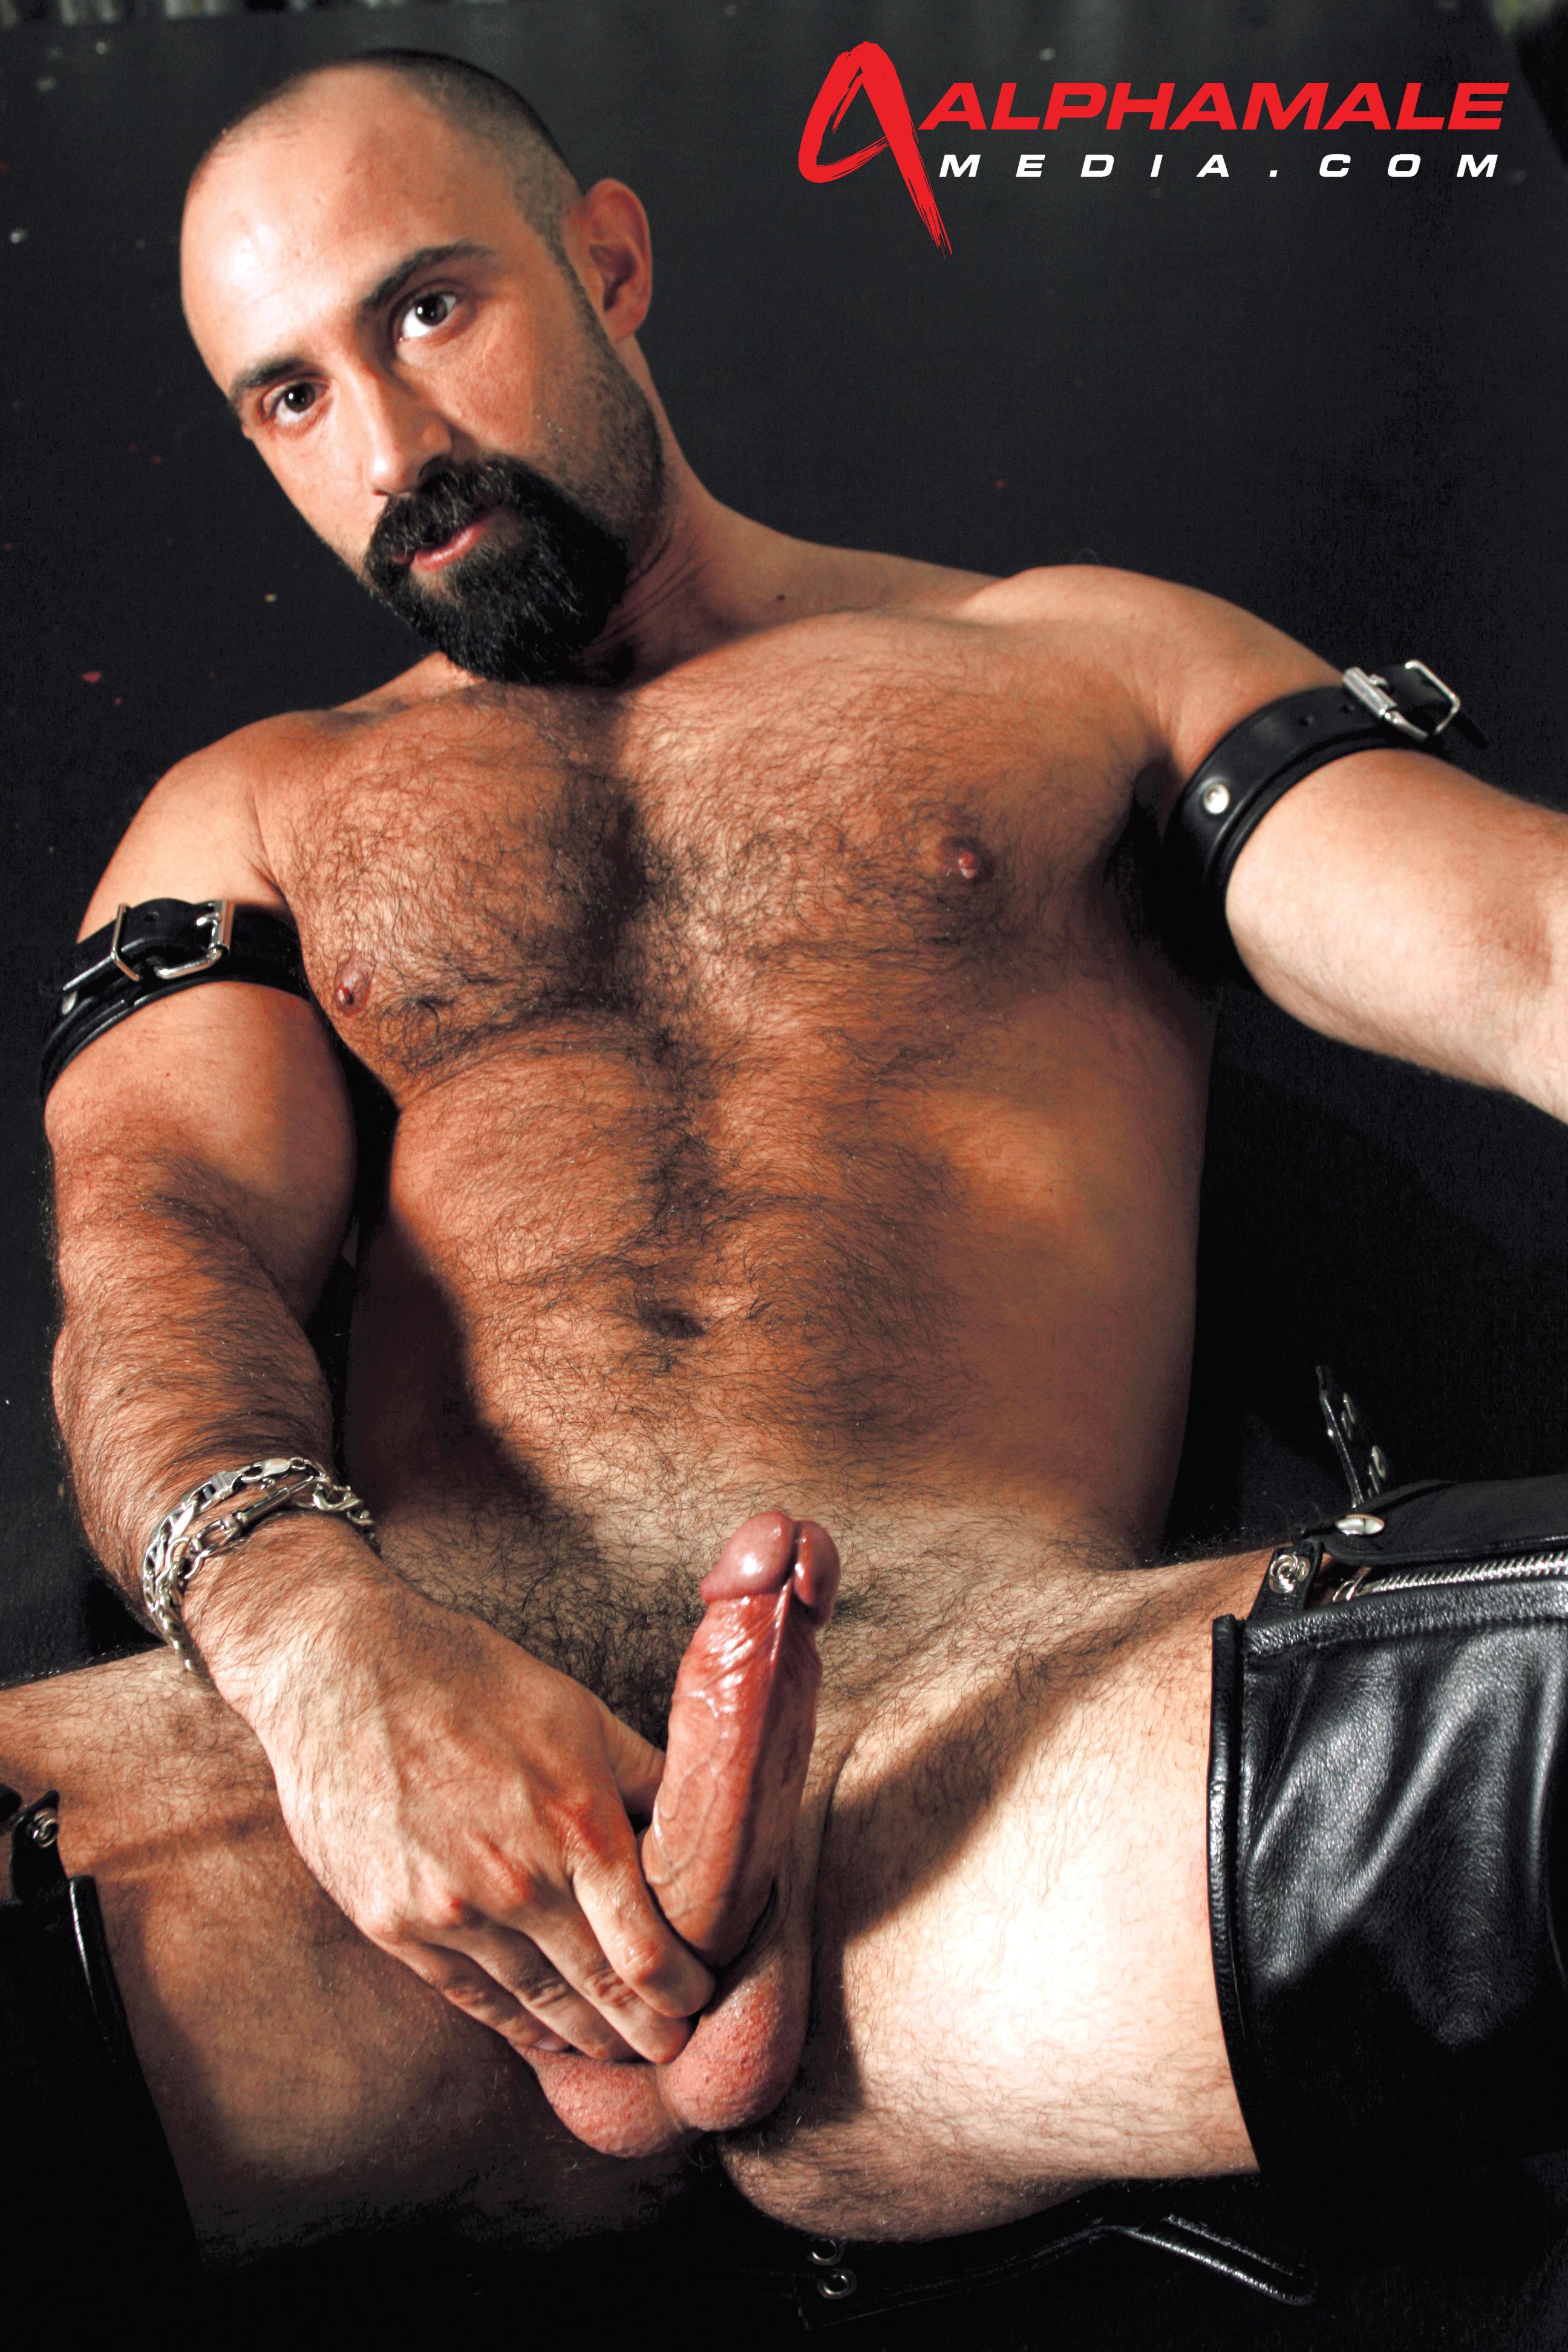 Actor Porno Español Gay De Moda butch grand gay | gay fetish xxx